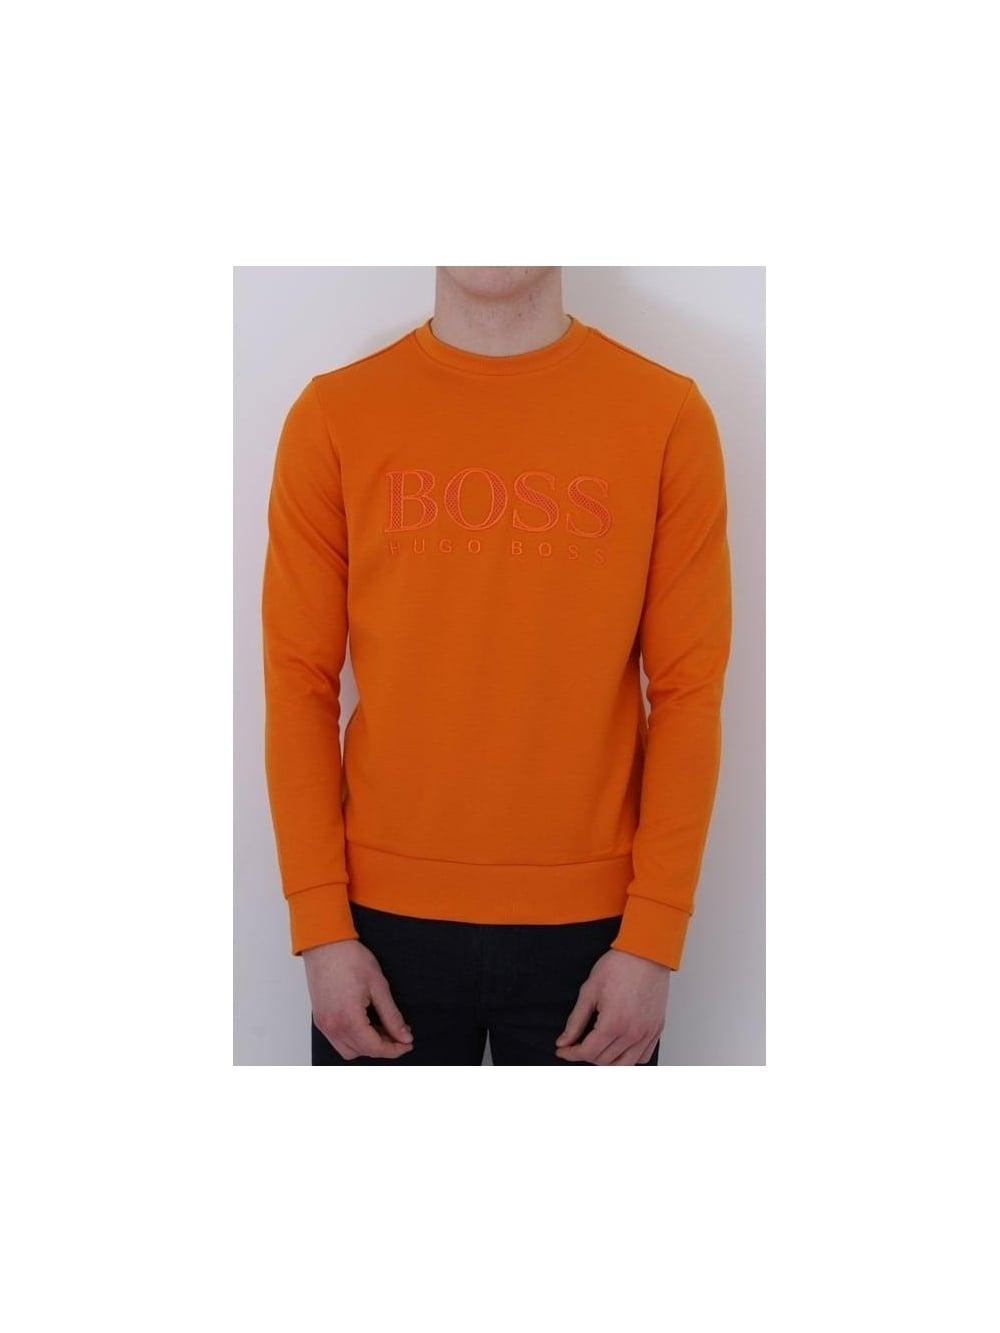 HUGO BOSS BOSS Green Salbo Sweat In Orange - Northern Threads 71e1fb51cc9e